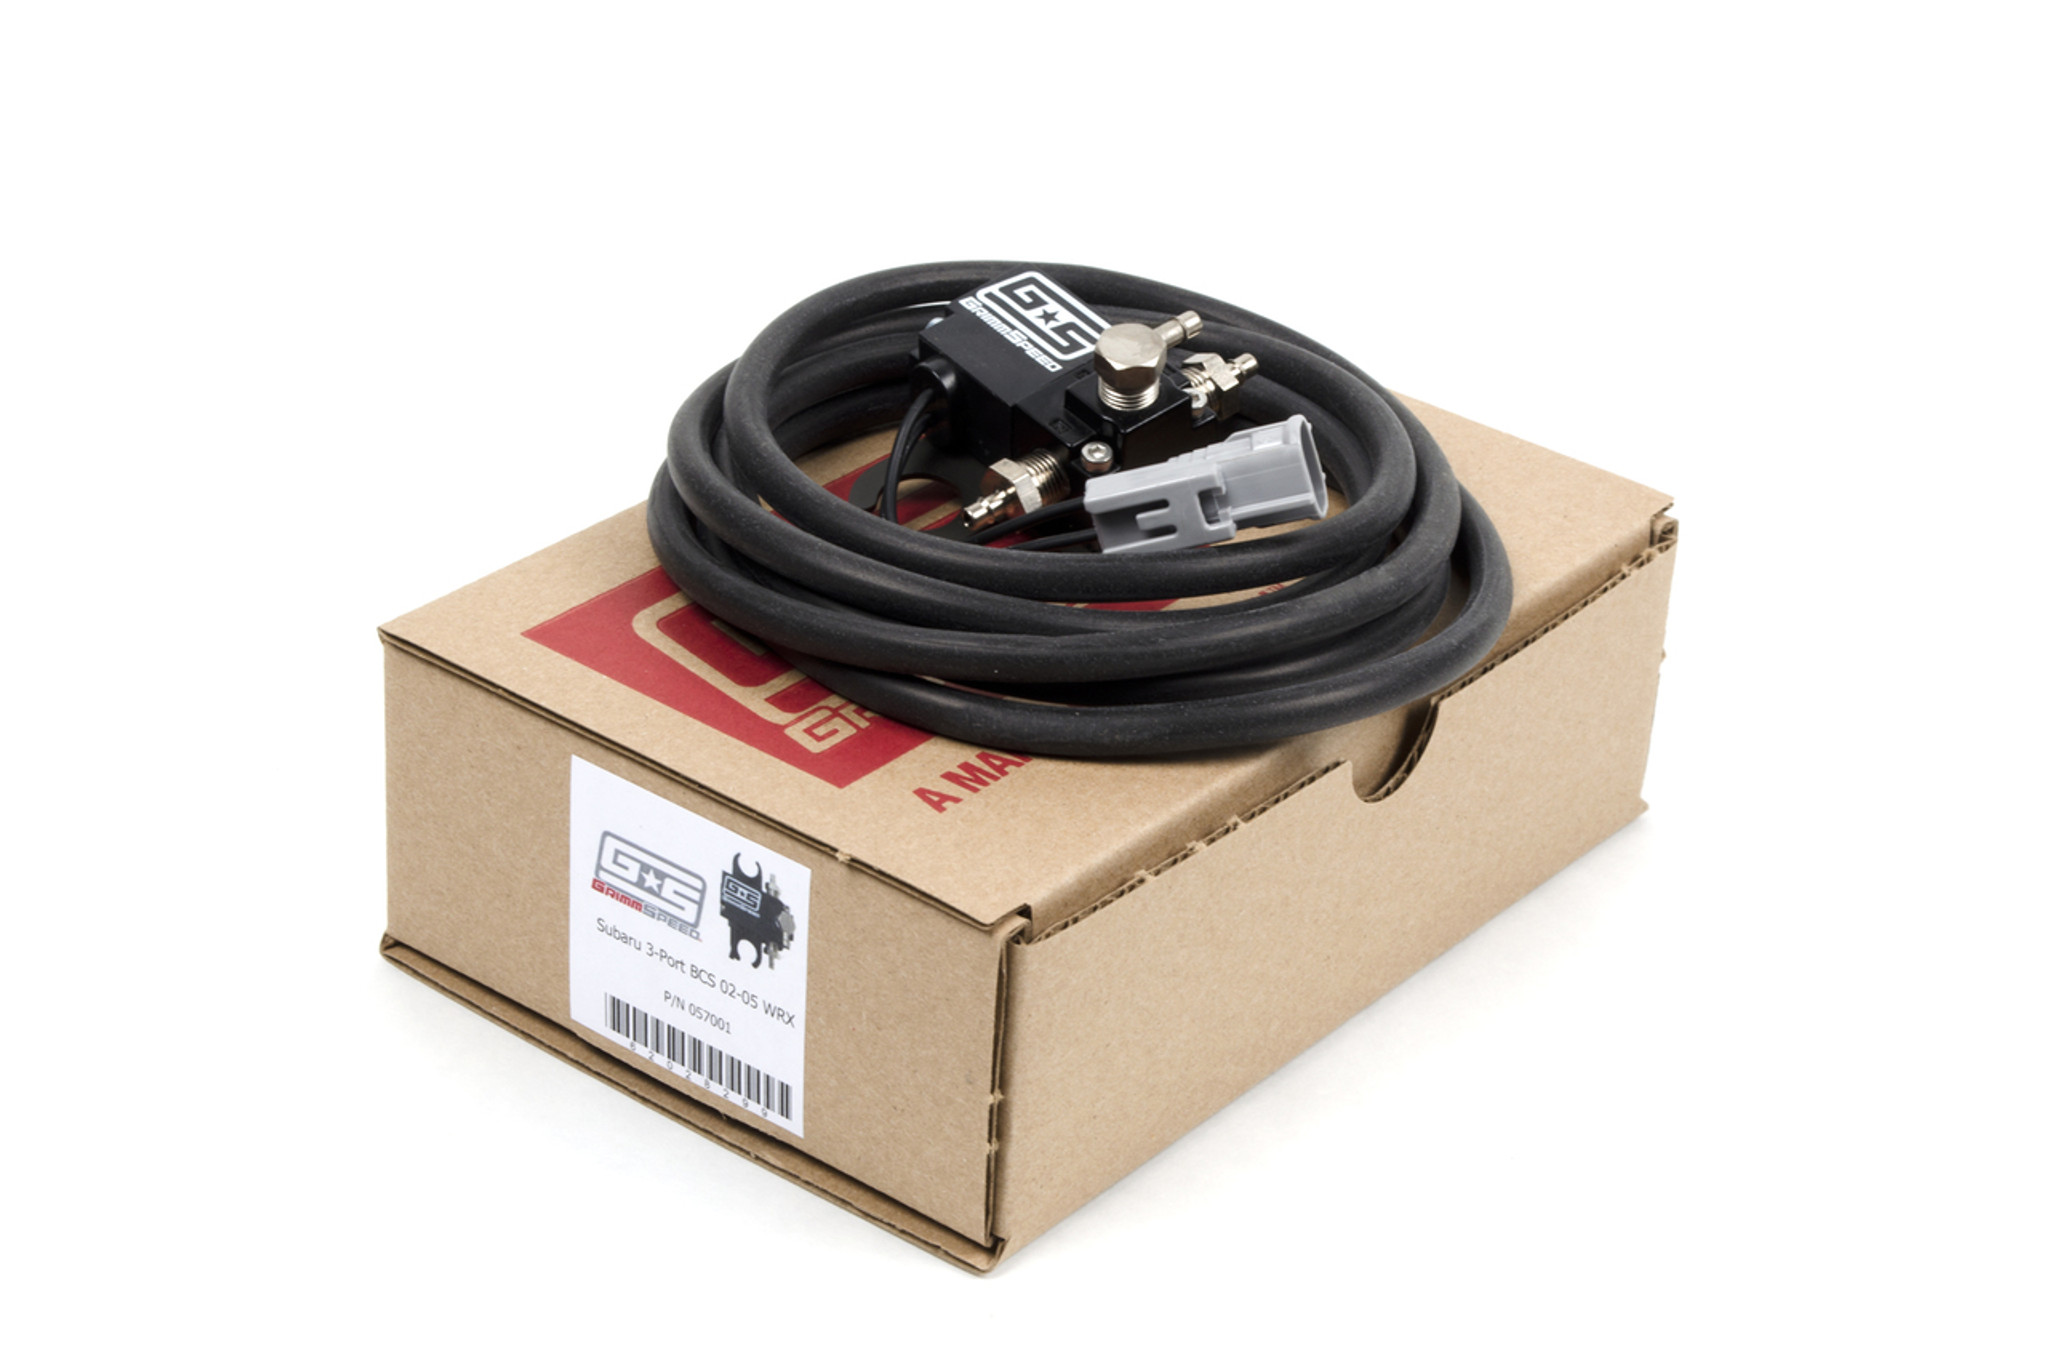 Electronic Boost Control Solenoid 3 Port Subaru 02 05 Wrx Grimmspeed Wiring Diagram Rims Bcs